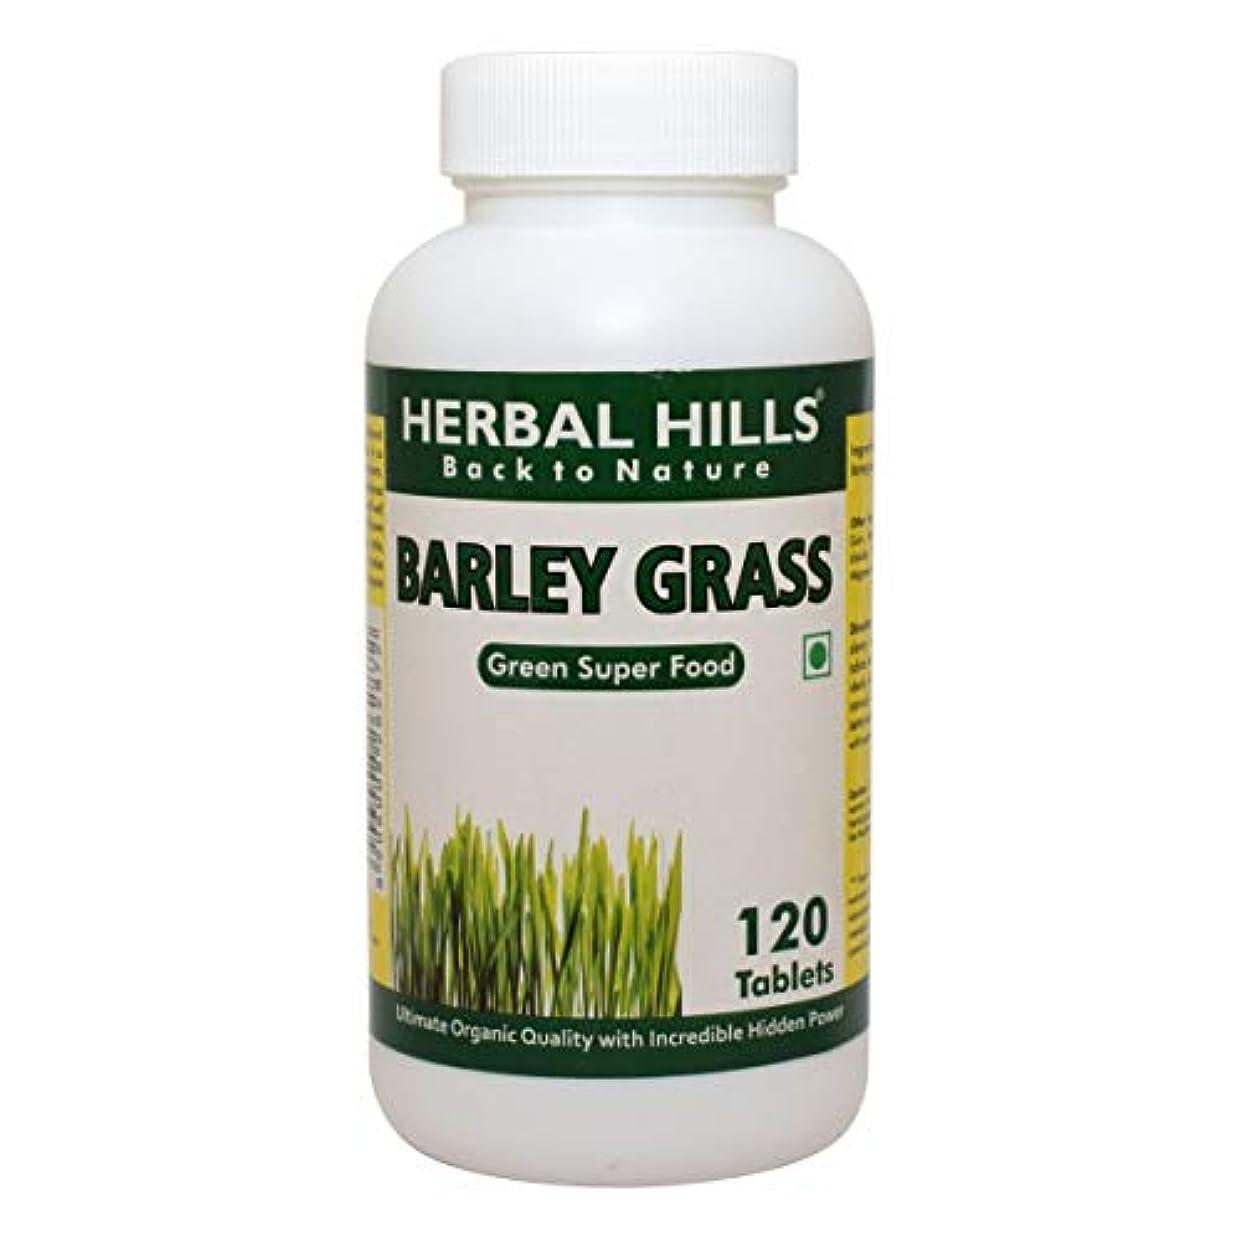 Barley Grass Food Supplement 500mg, 120 Tablets - 大麦草食品サプリメント